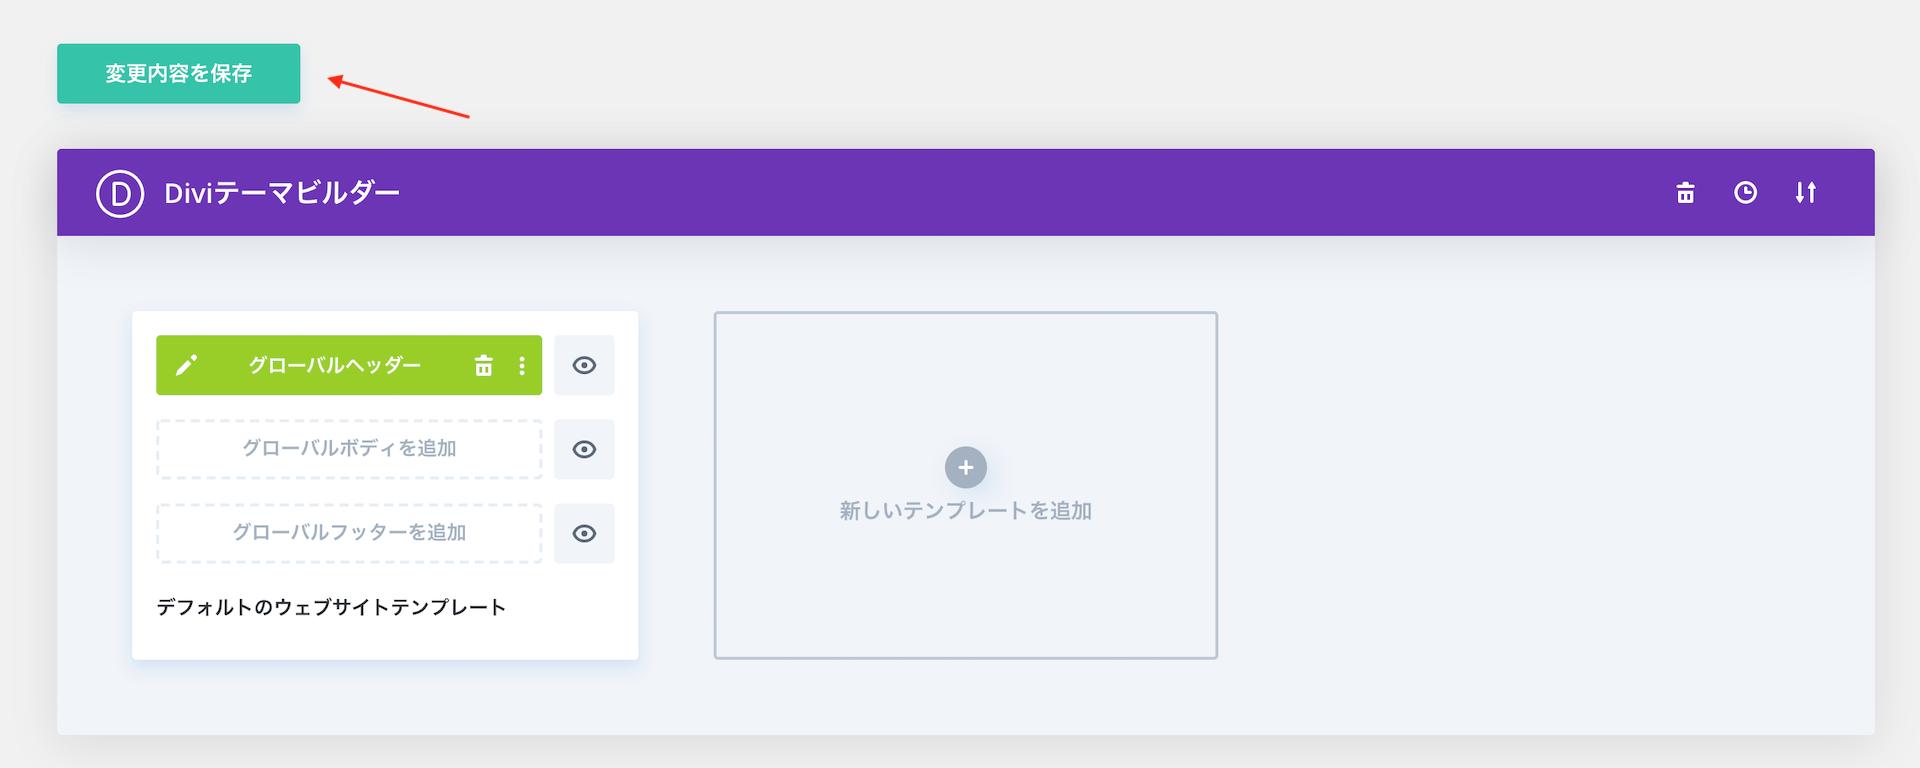 Divi テーマビルダー 変更内容を保存